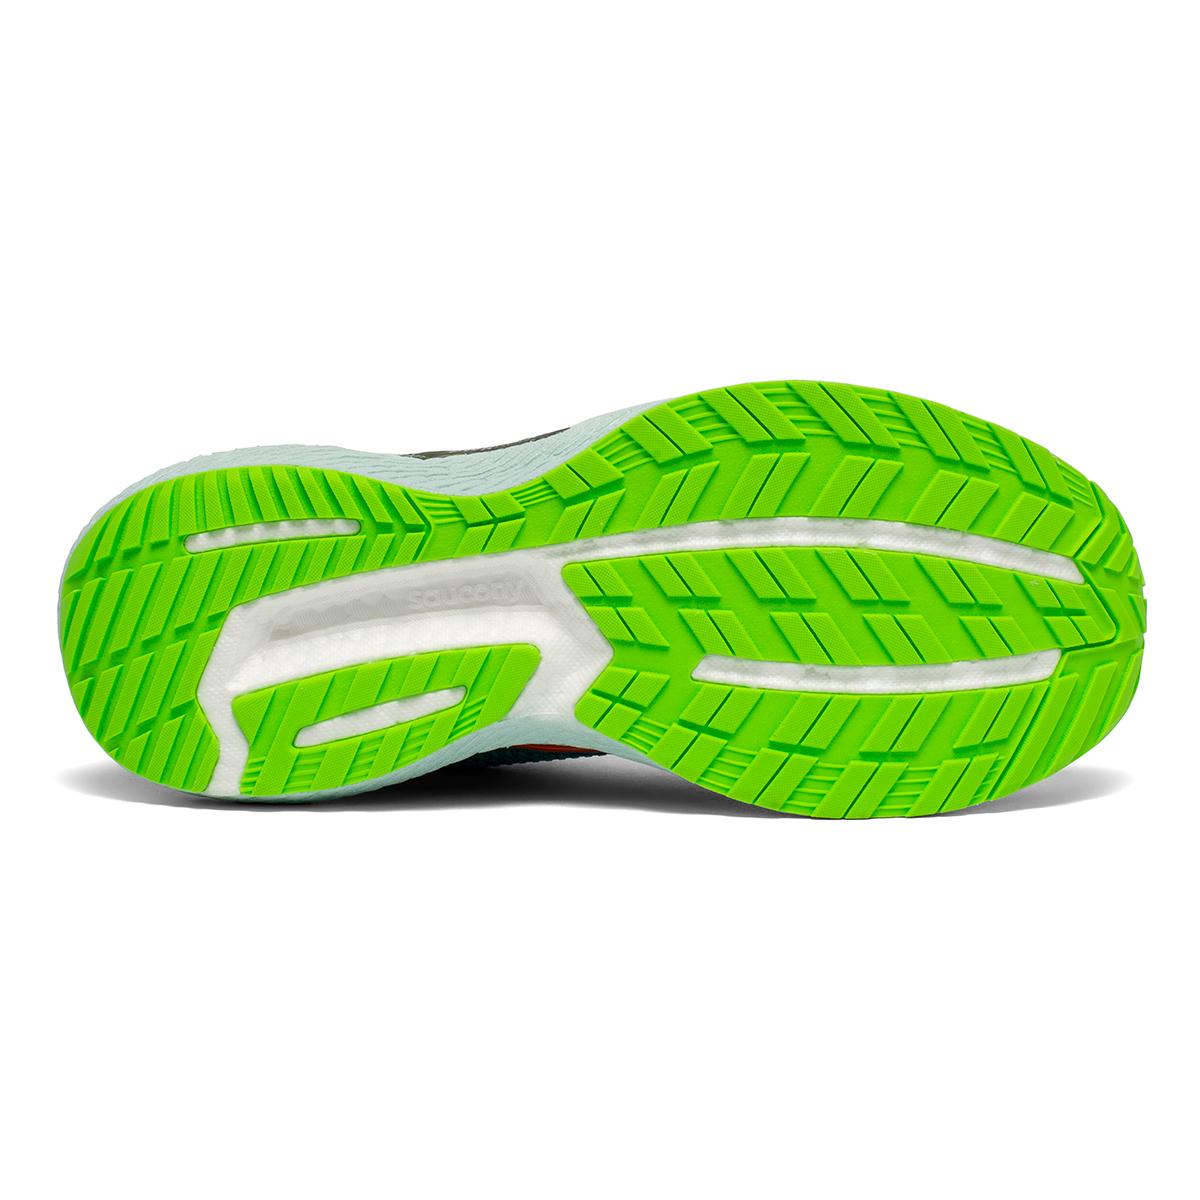 Men's Saucony Triumph 18 Running Shoe - Color: Future/Blue - Size: 7 - Width: Regular, Future/Blue, large, image 2